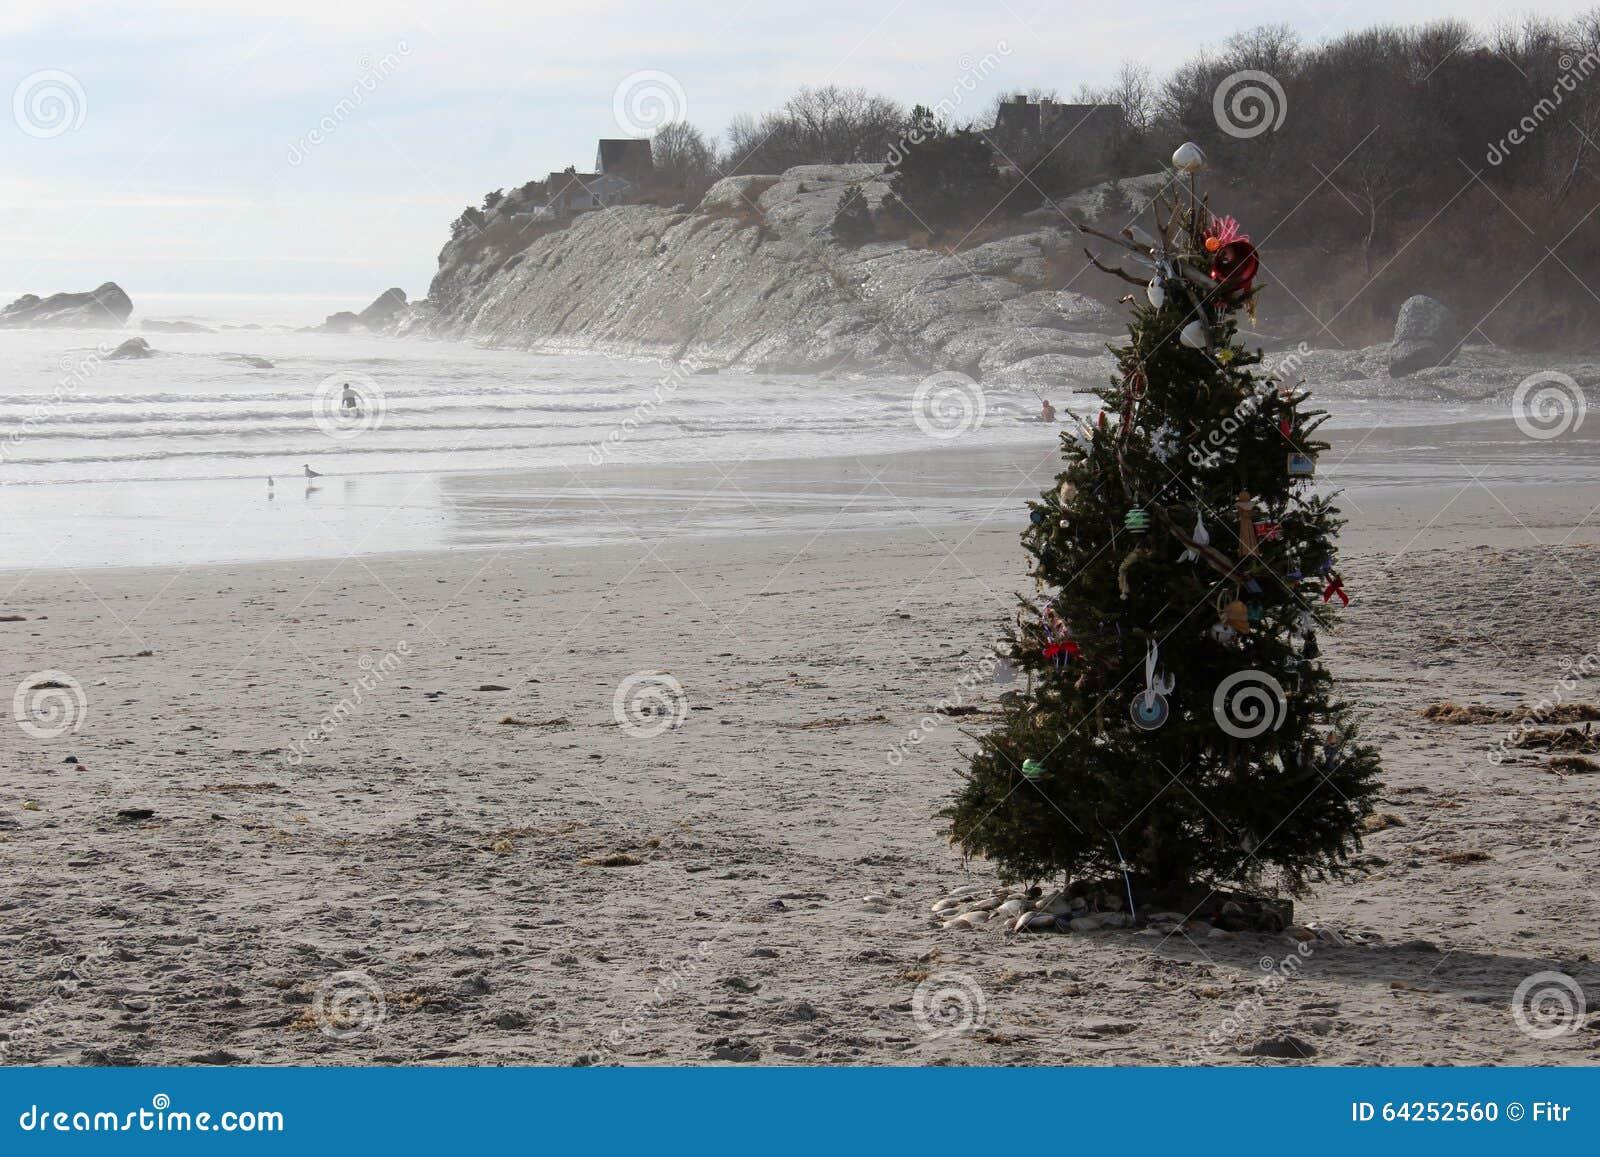 Christmas Tree on beach stock photo. Image of decorated ...